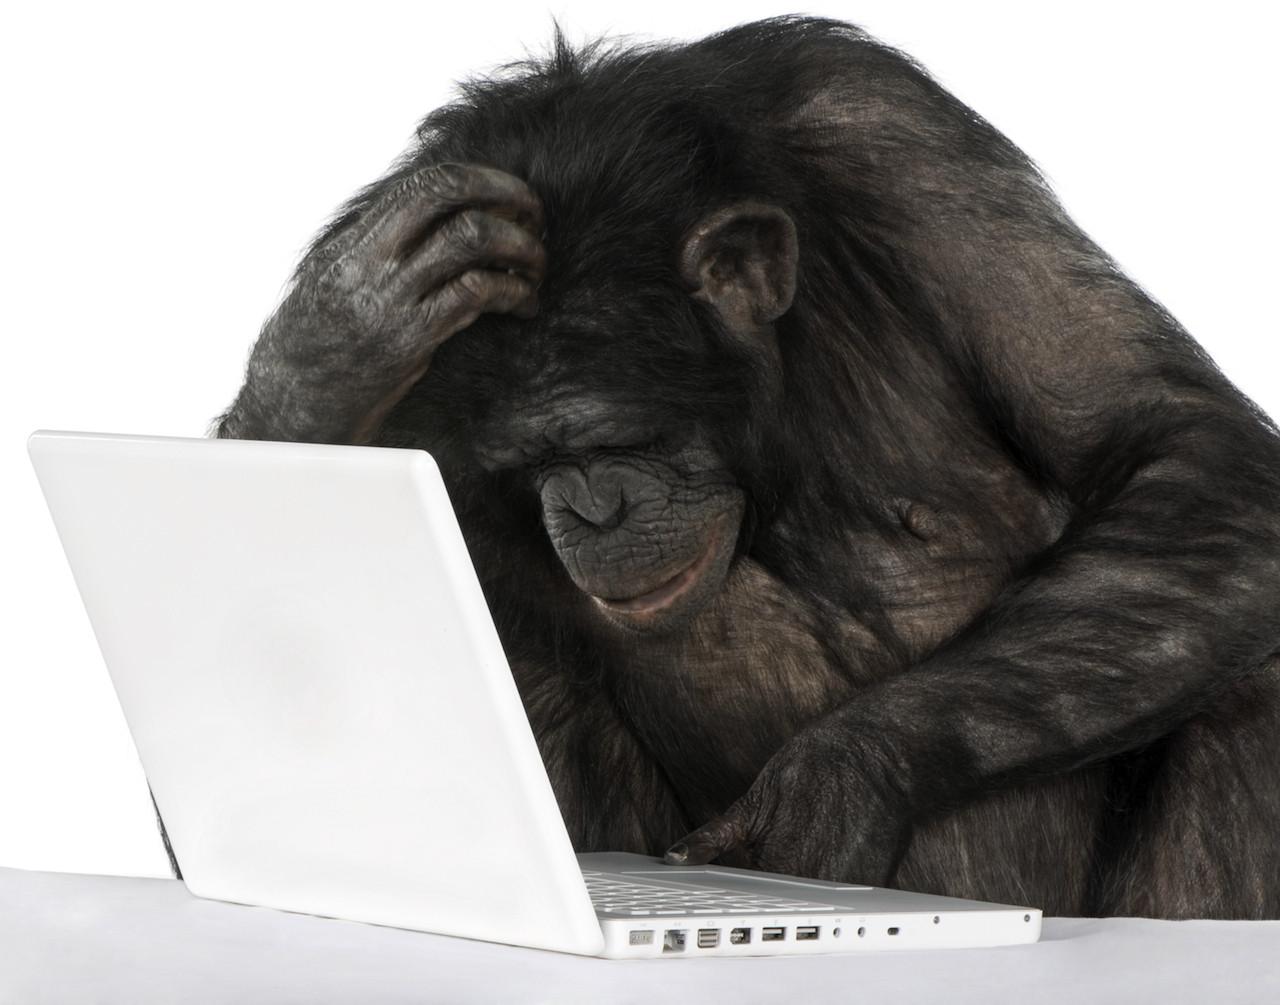 poster computer monkey